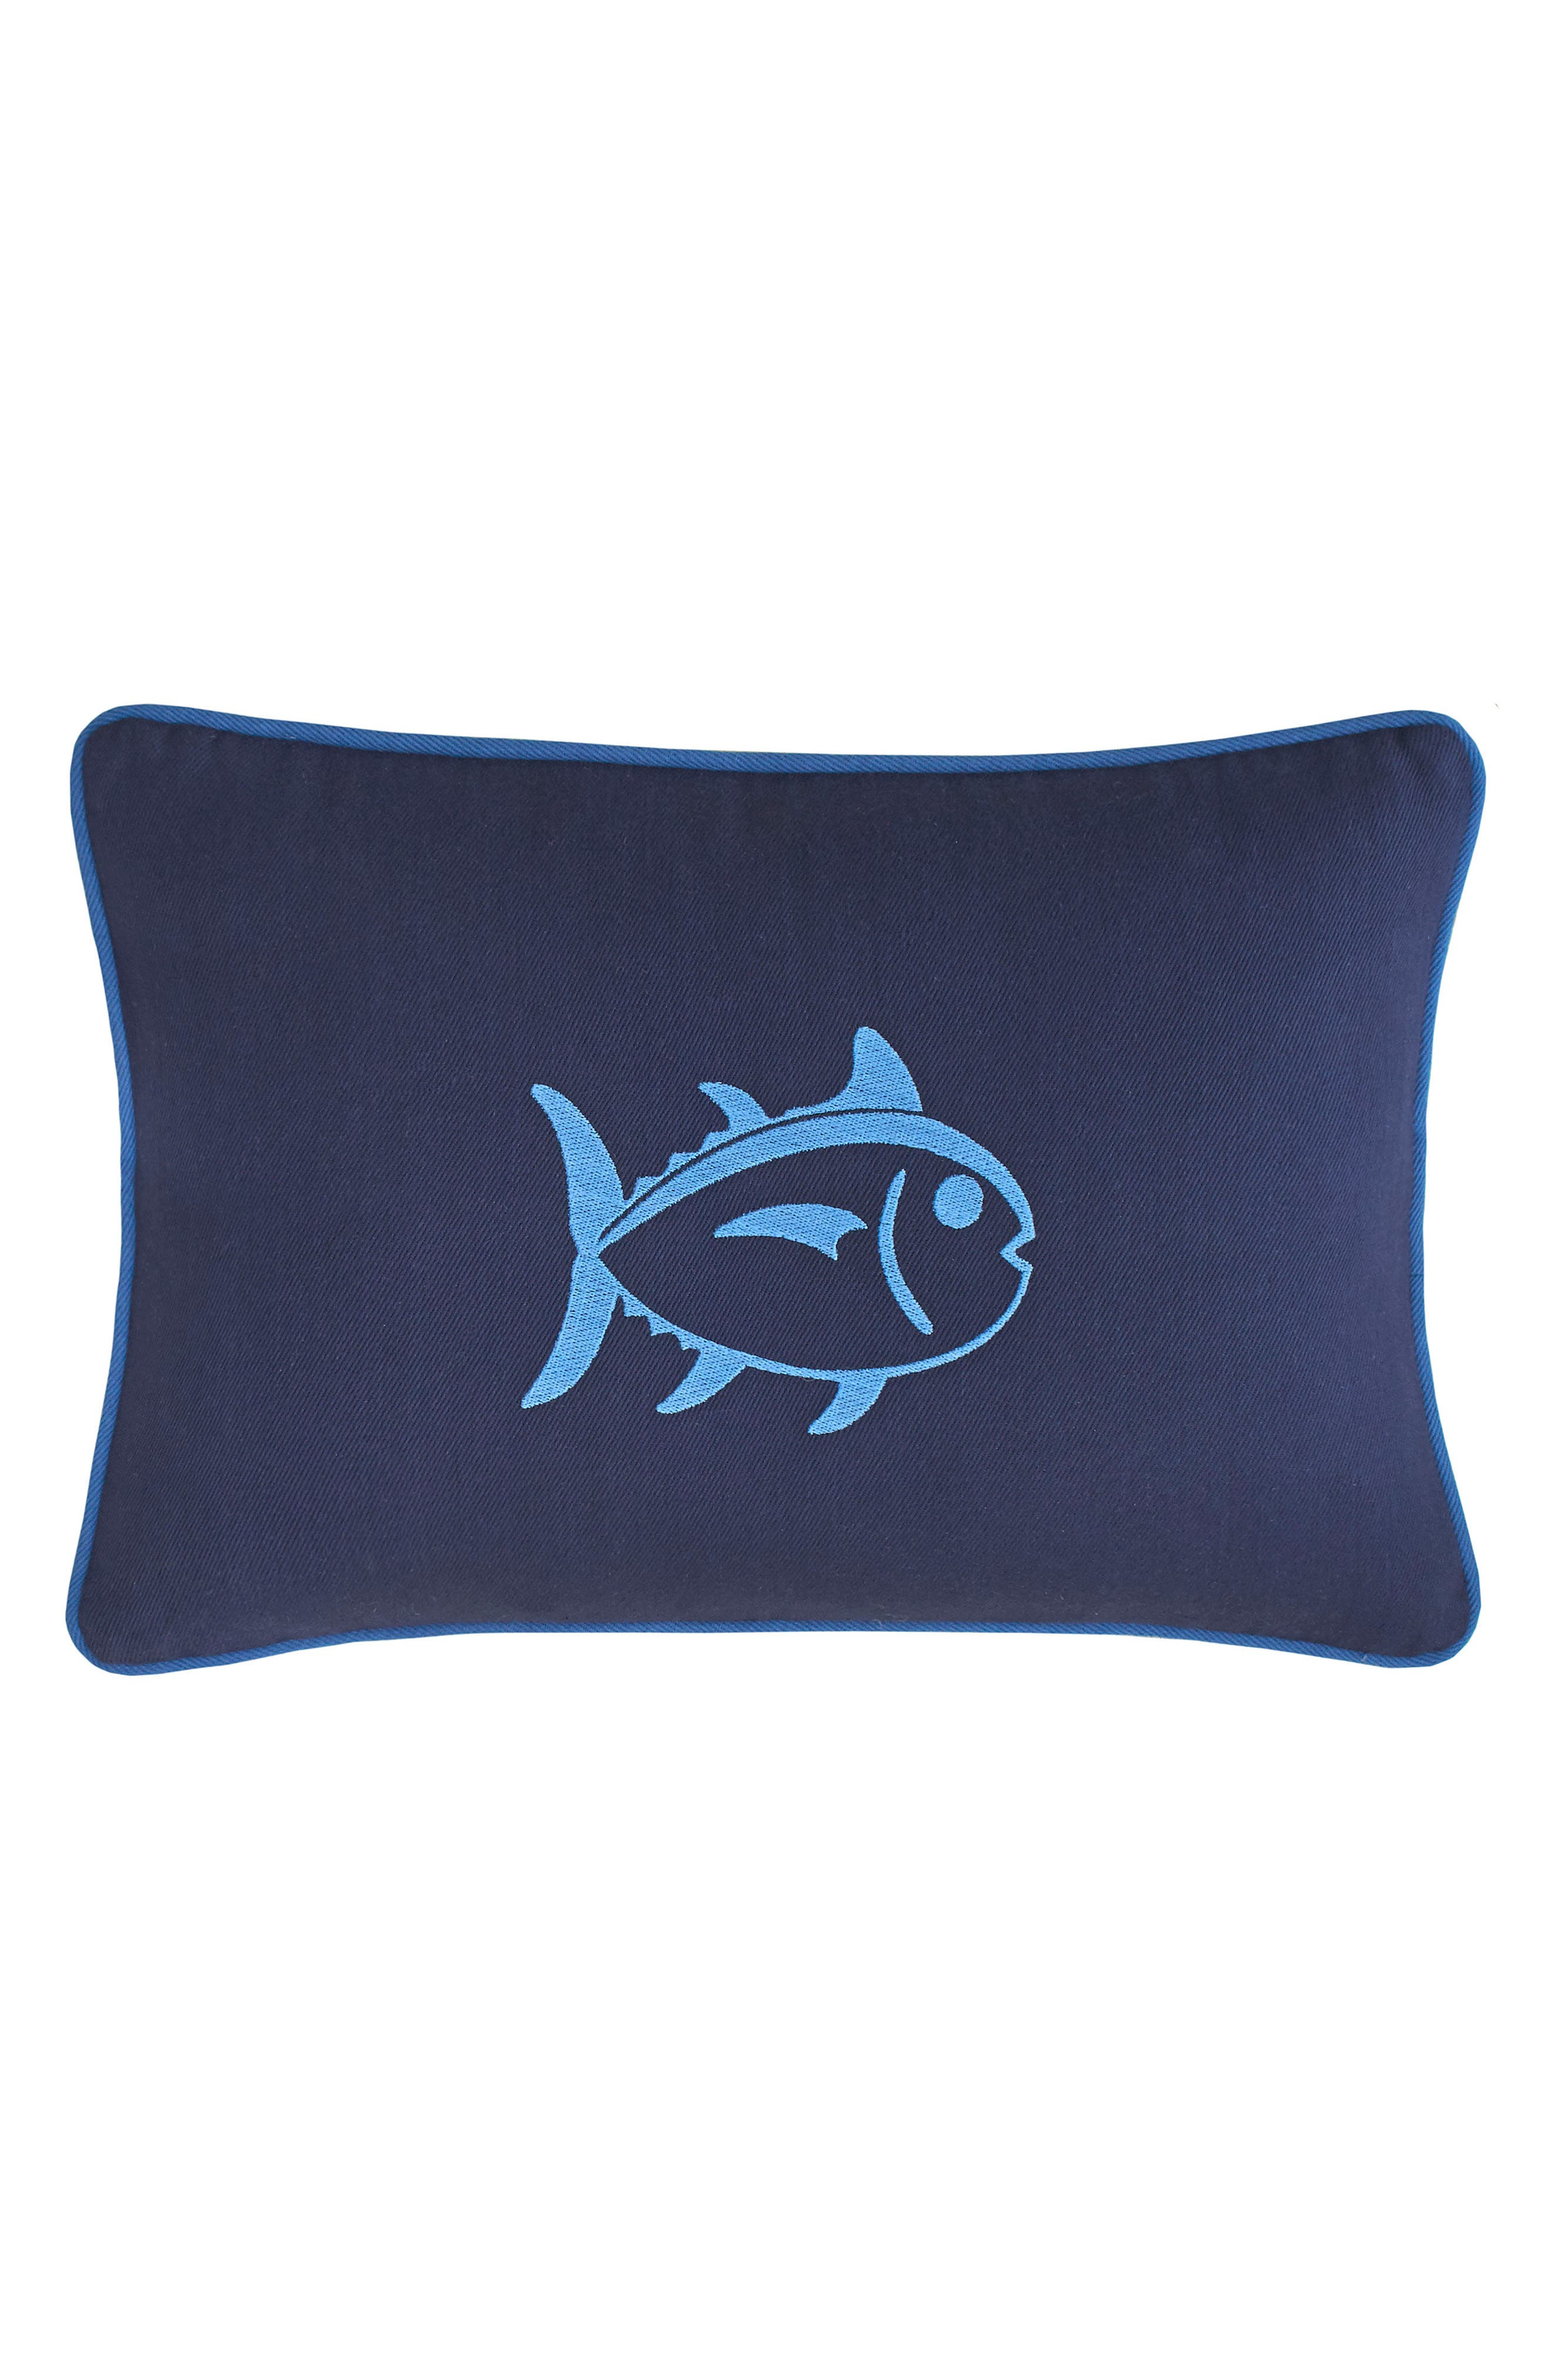 Dock Street Stripe Skipjack Accent Pillow,                             Main thumbnail 1, color,                             400